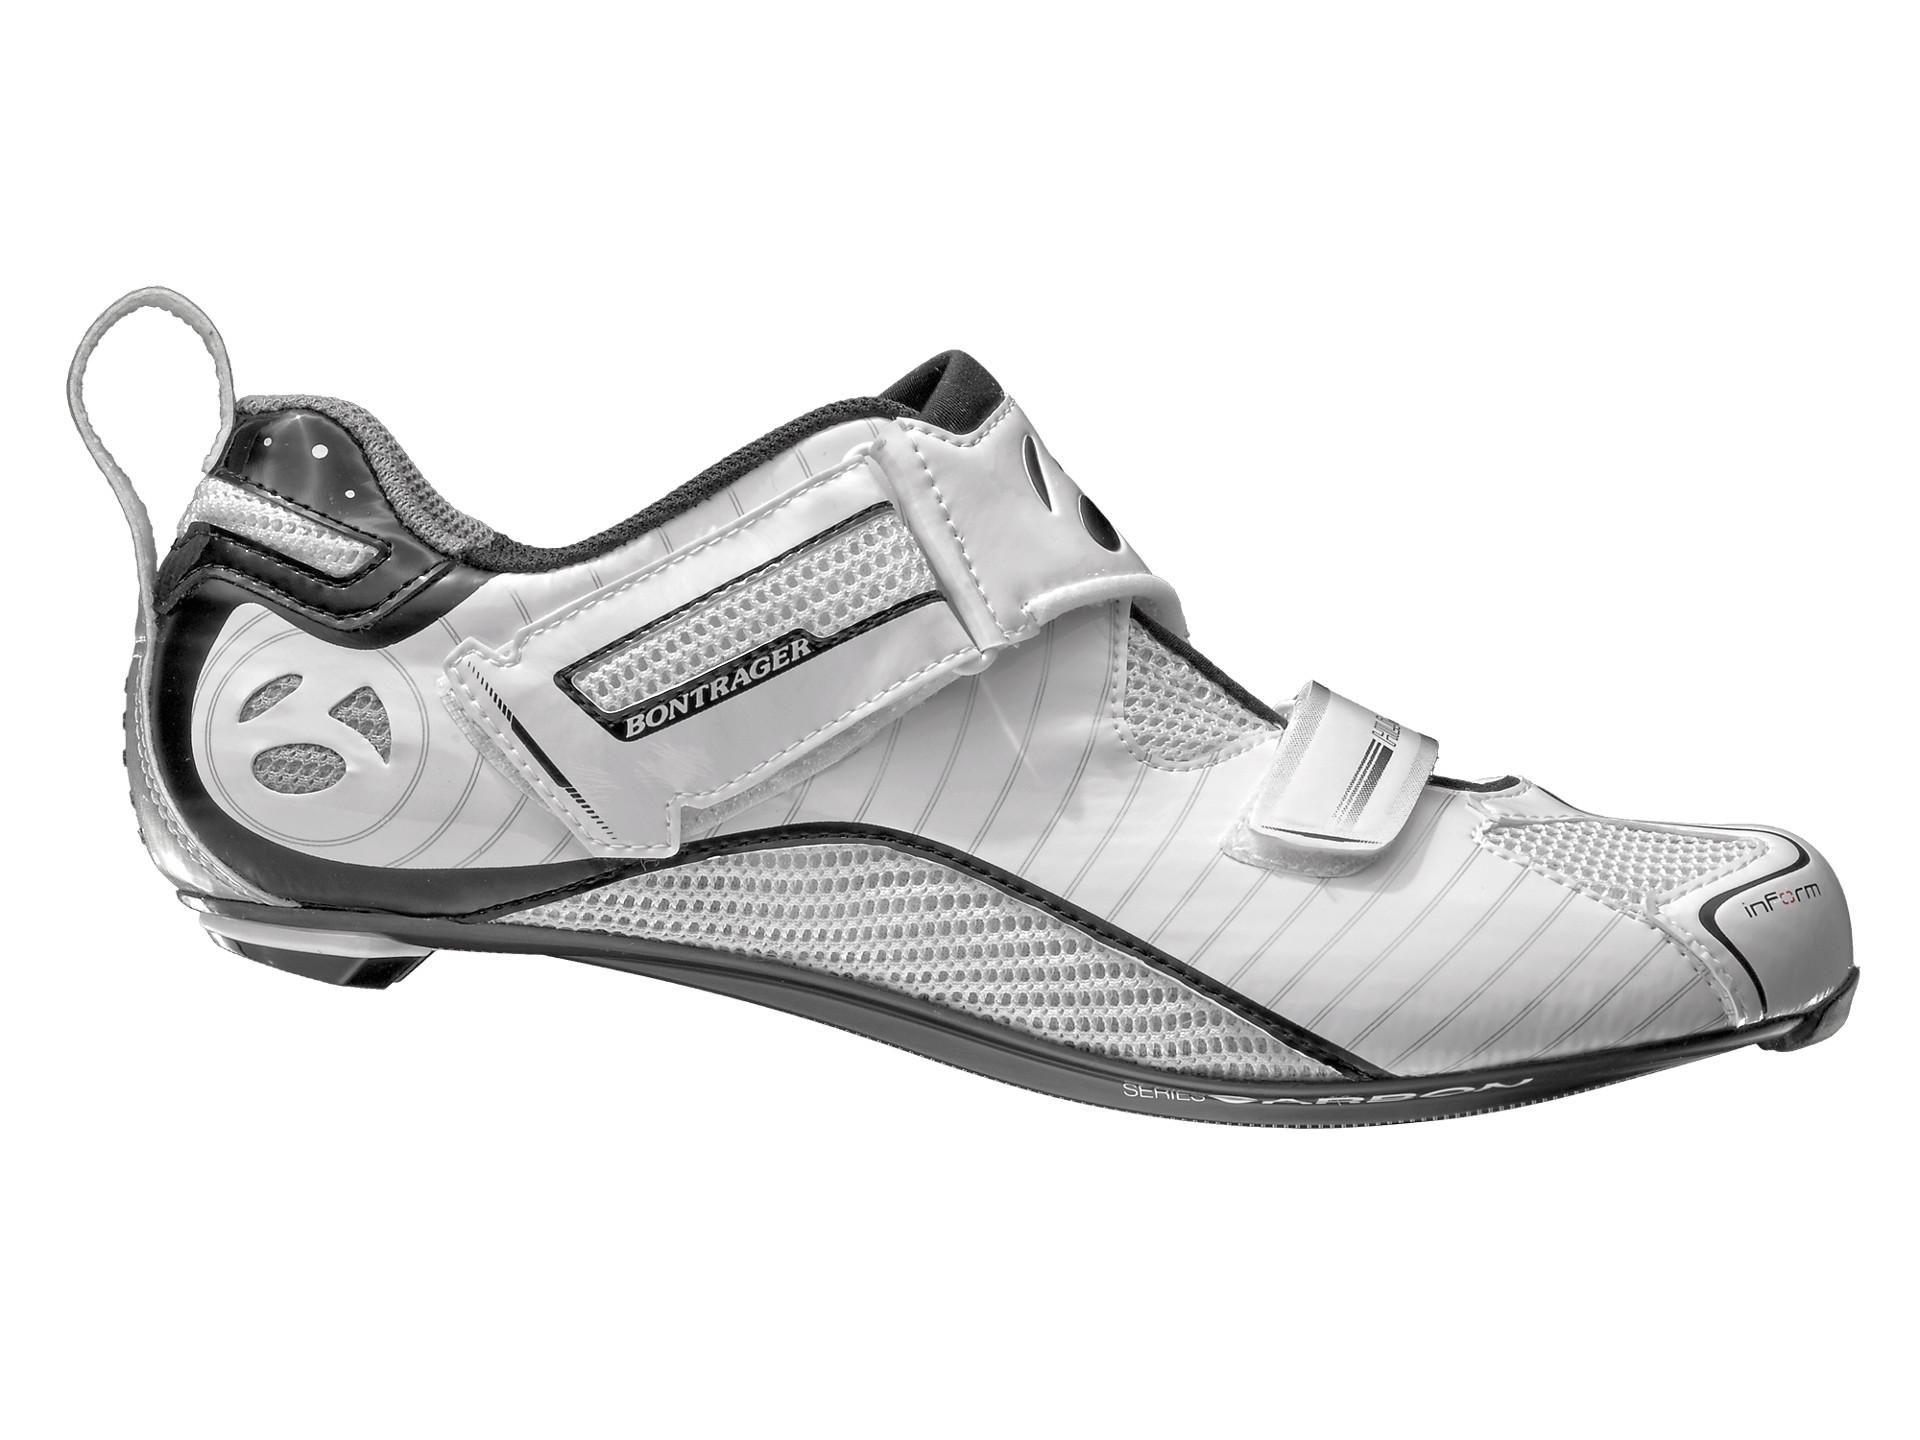 Scarpe Hilo RXL Triathlon Bontrager  9178e0117bb